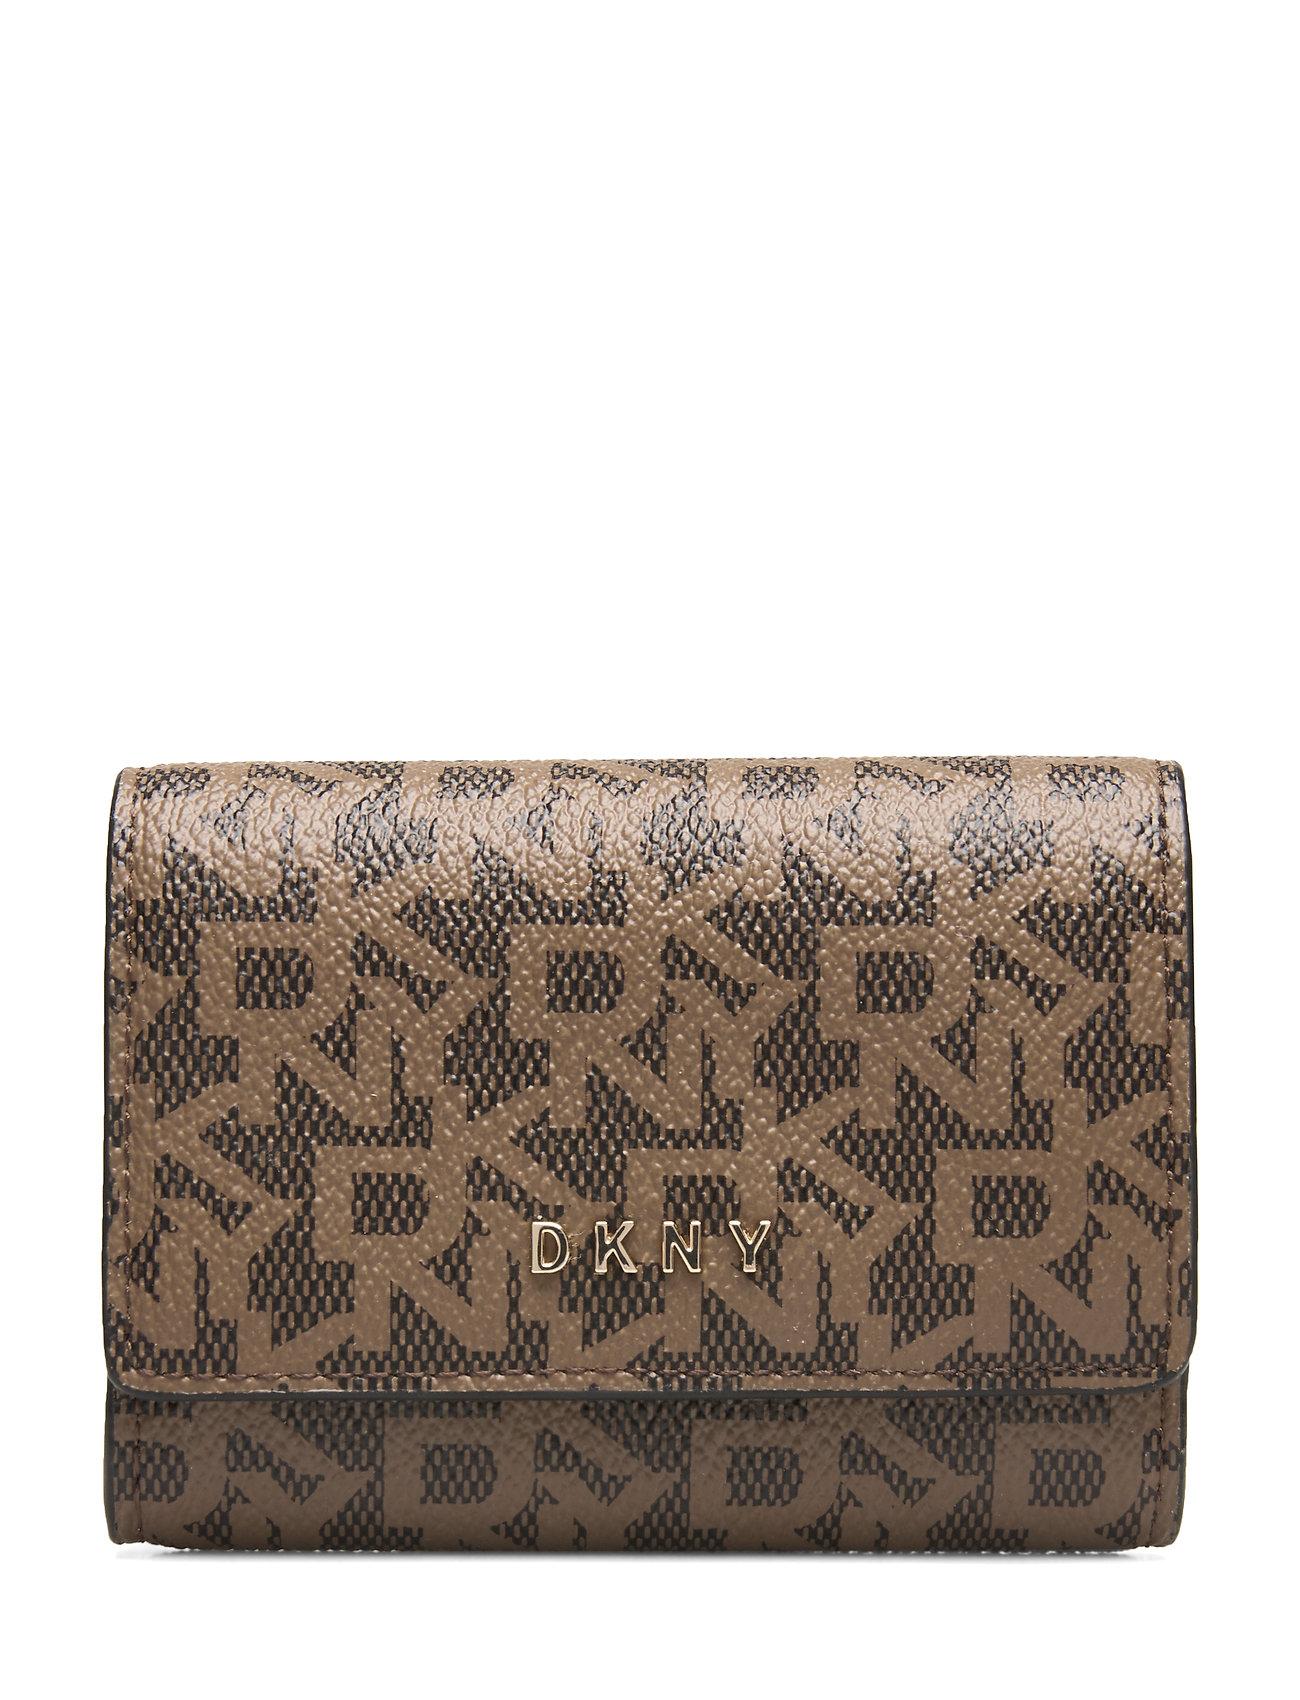 DKNY Bags SLG-LOGO PVC - MOCHA/CRML